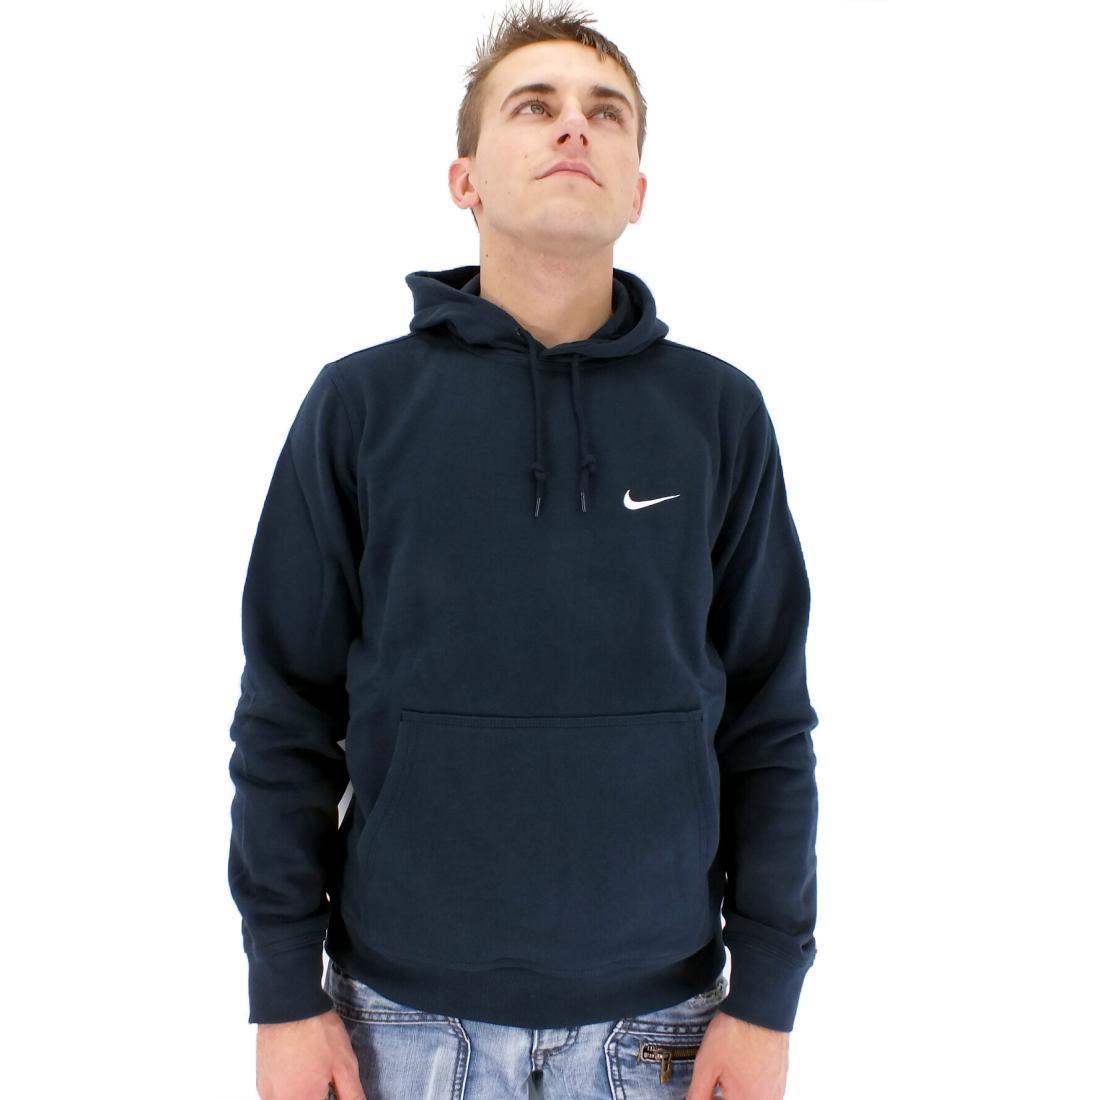 Nike Джемпер Мужской Доставка